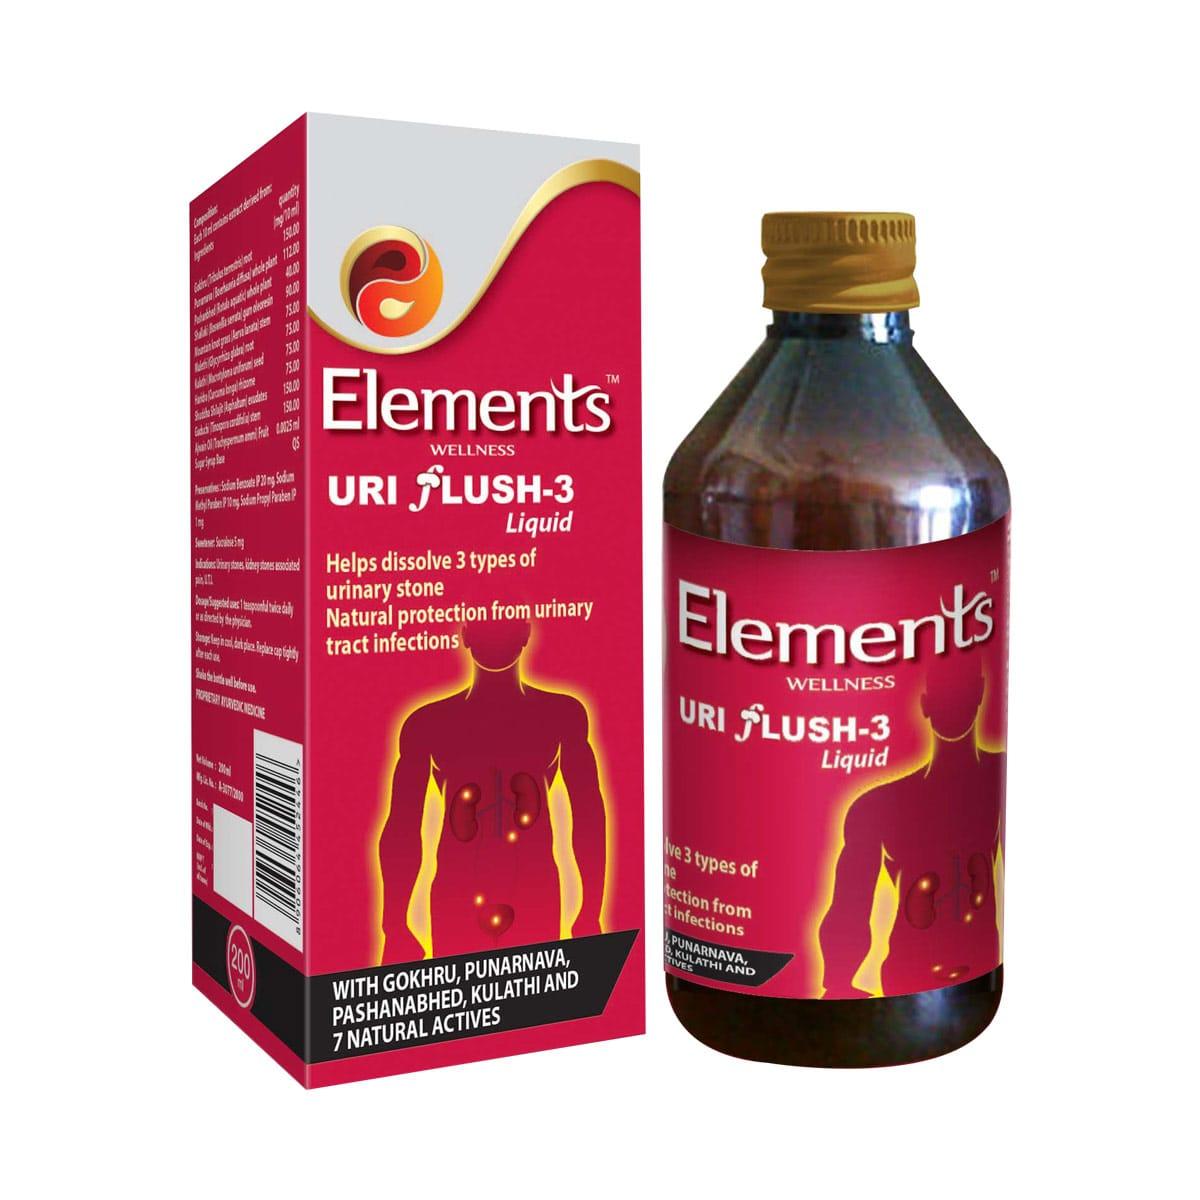 Elements Uri Flush 3 Liquid 2 Bottel